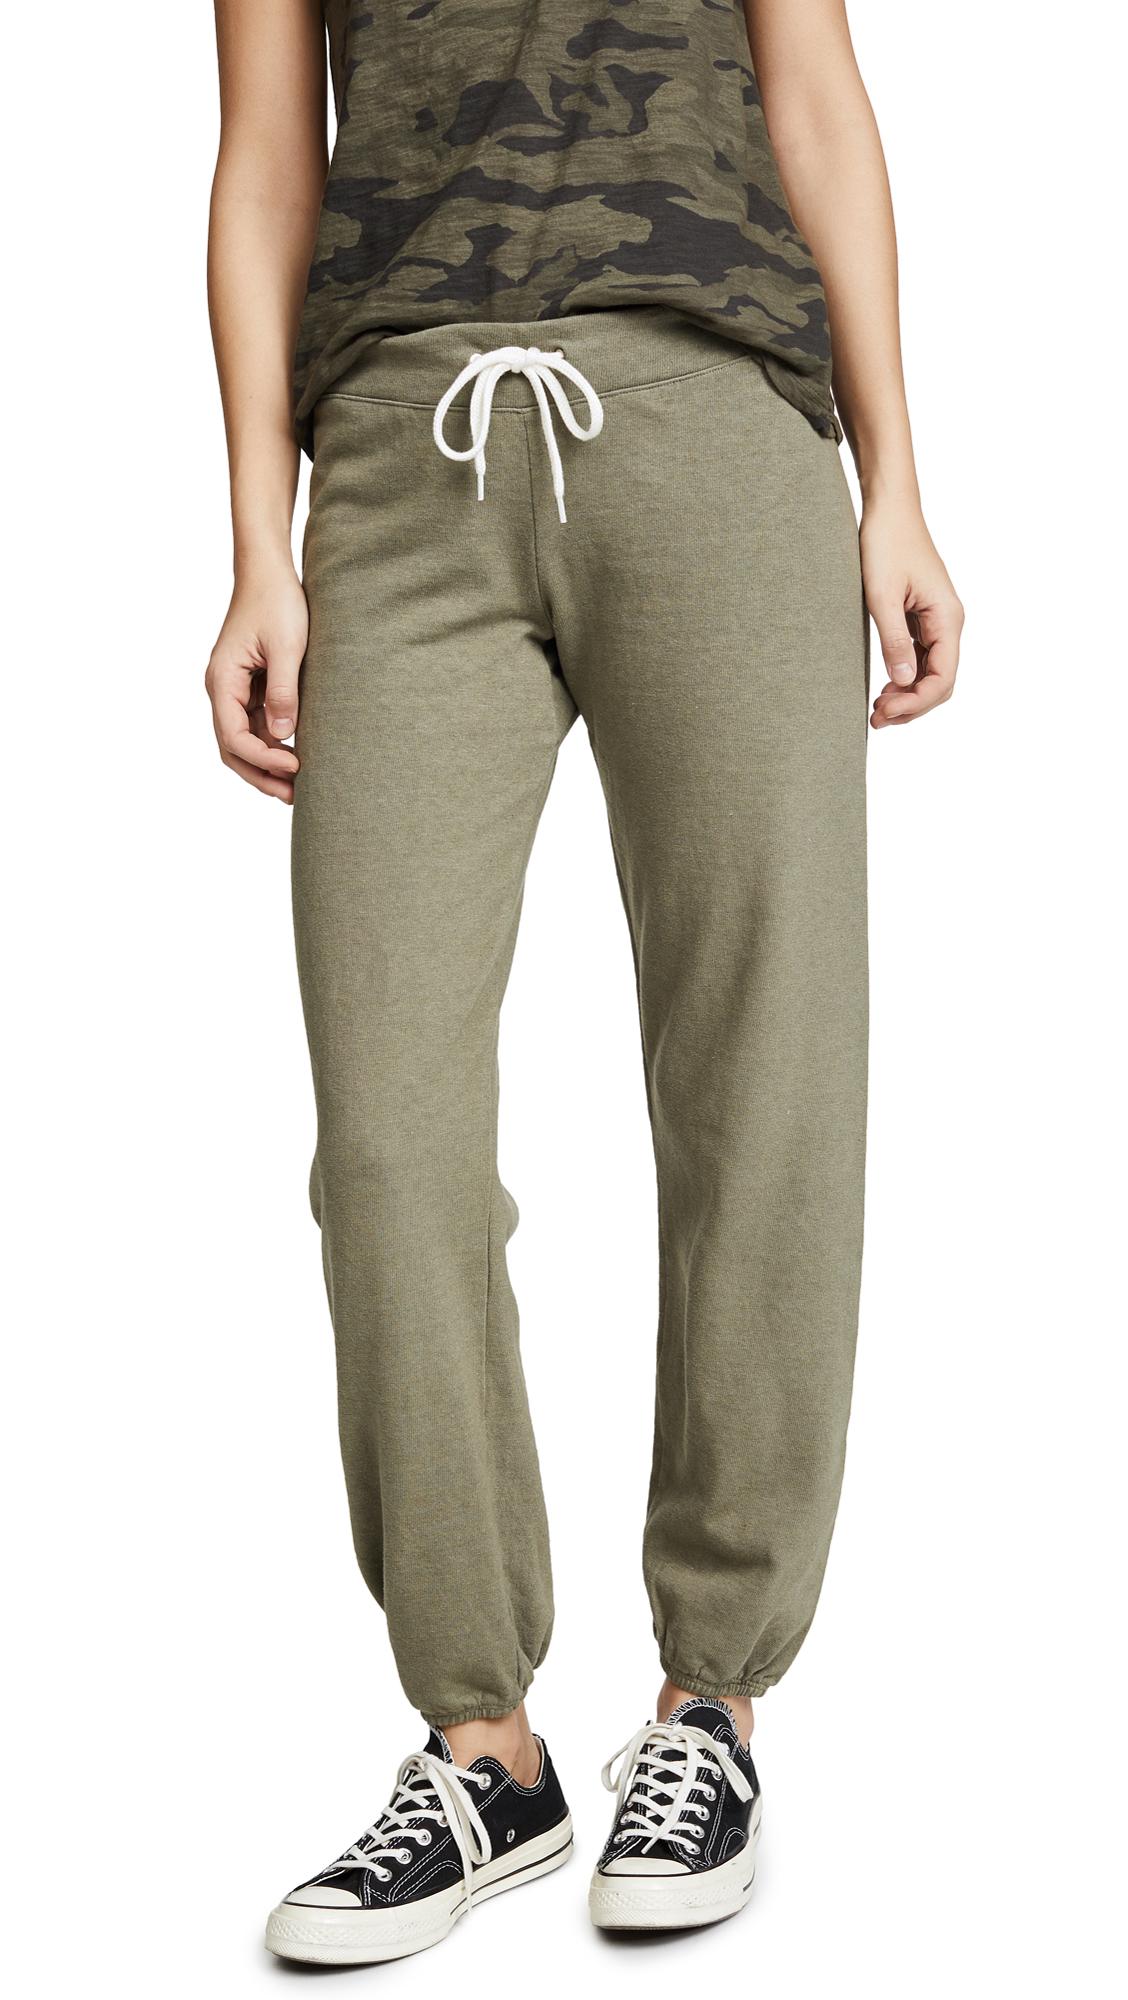 MONROW Vintage Sweatpants - Army